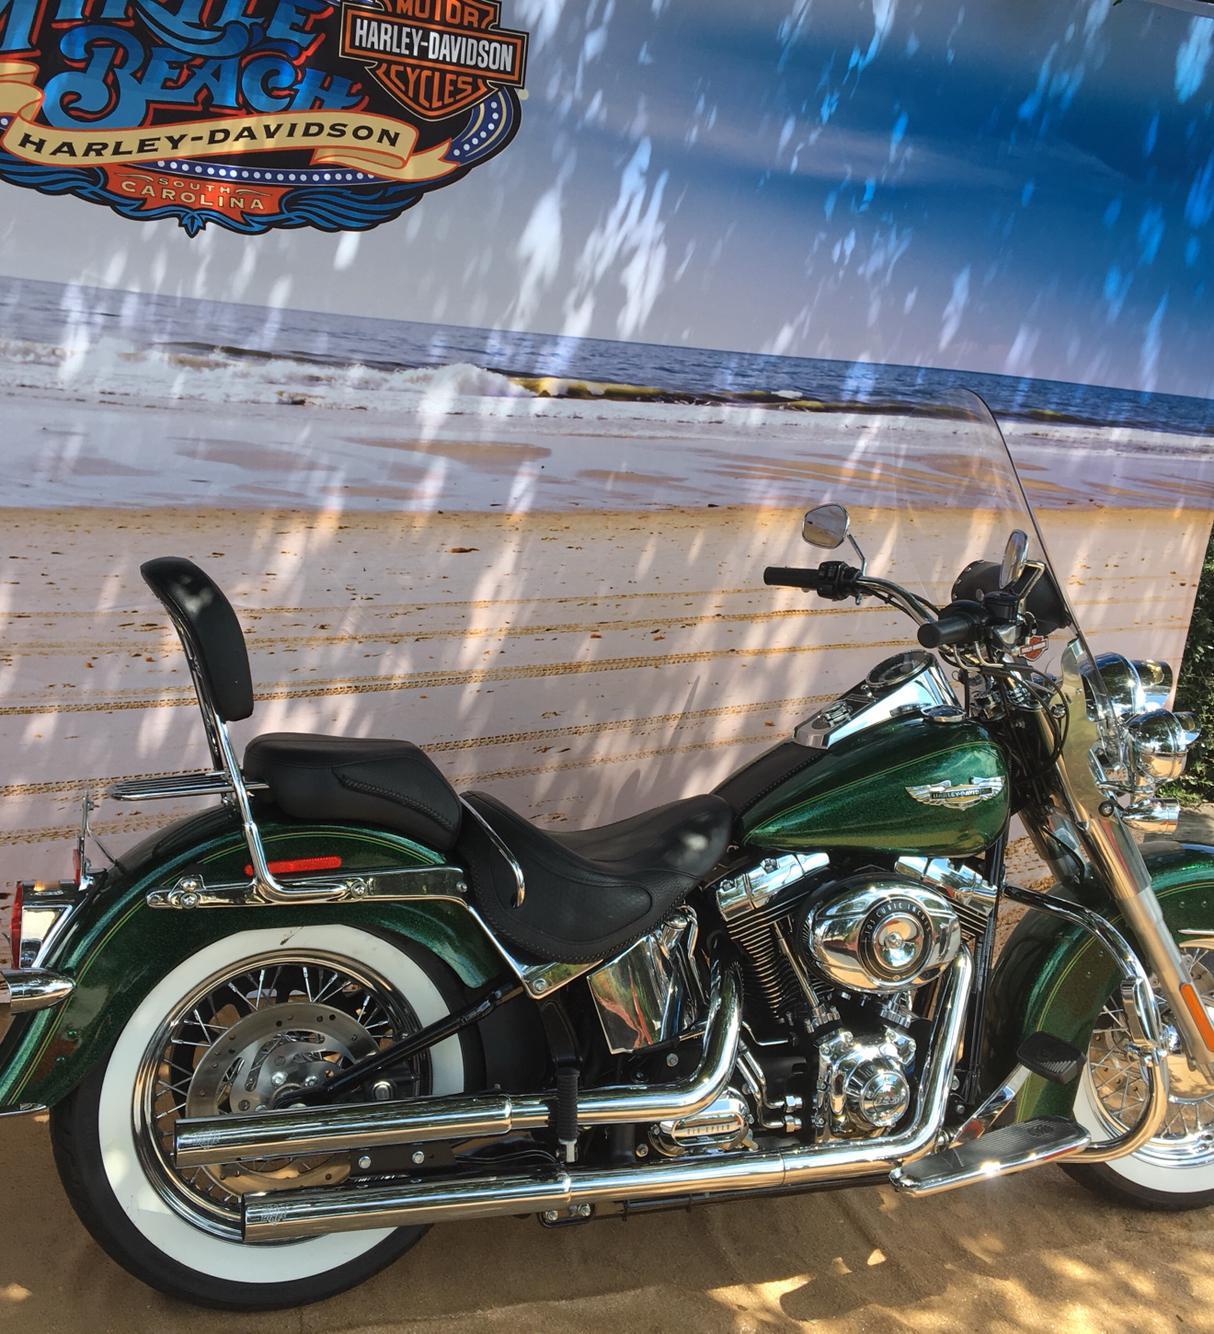 2013 Harley Davidson Flstn103 Softail D For Sale In Myrtle Beach Fire Ignition Wire Diagram Duo Dscn2089